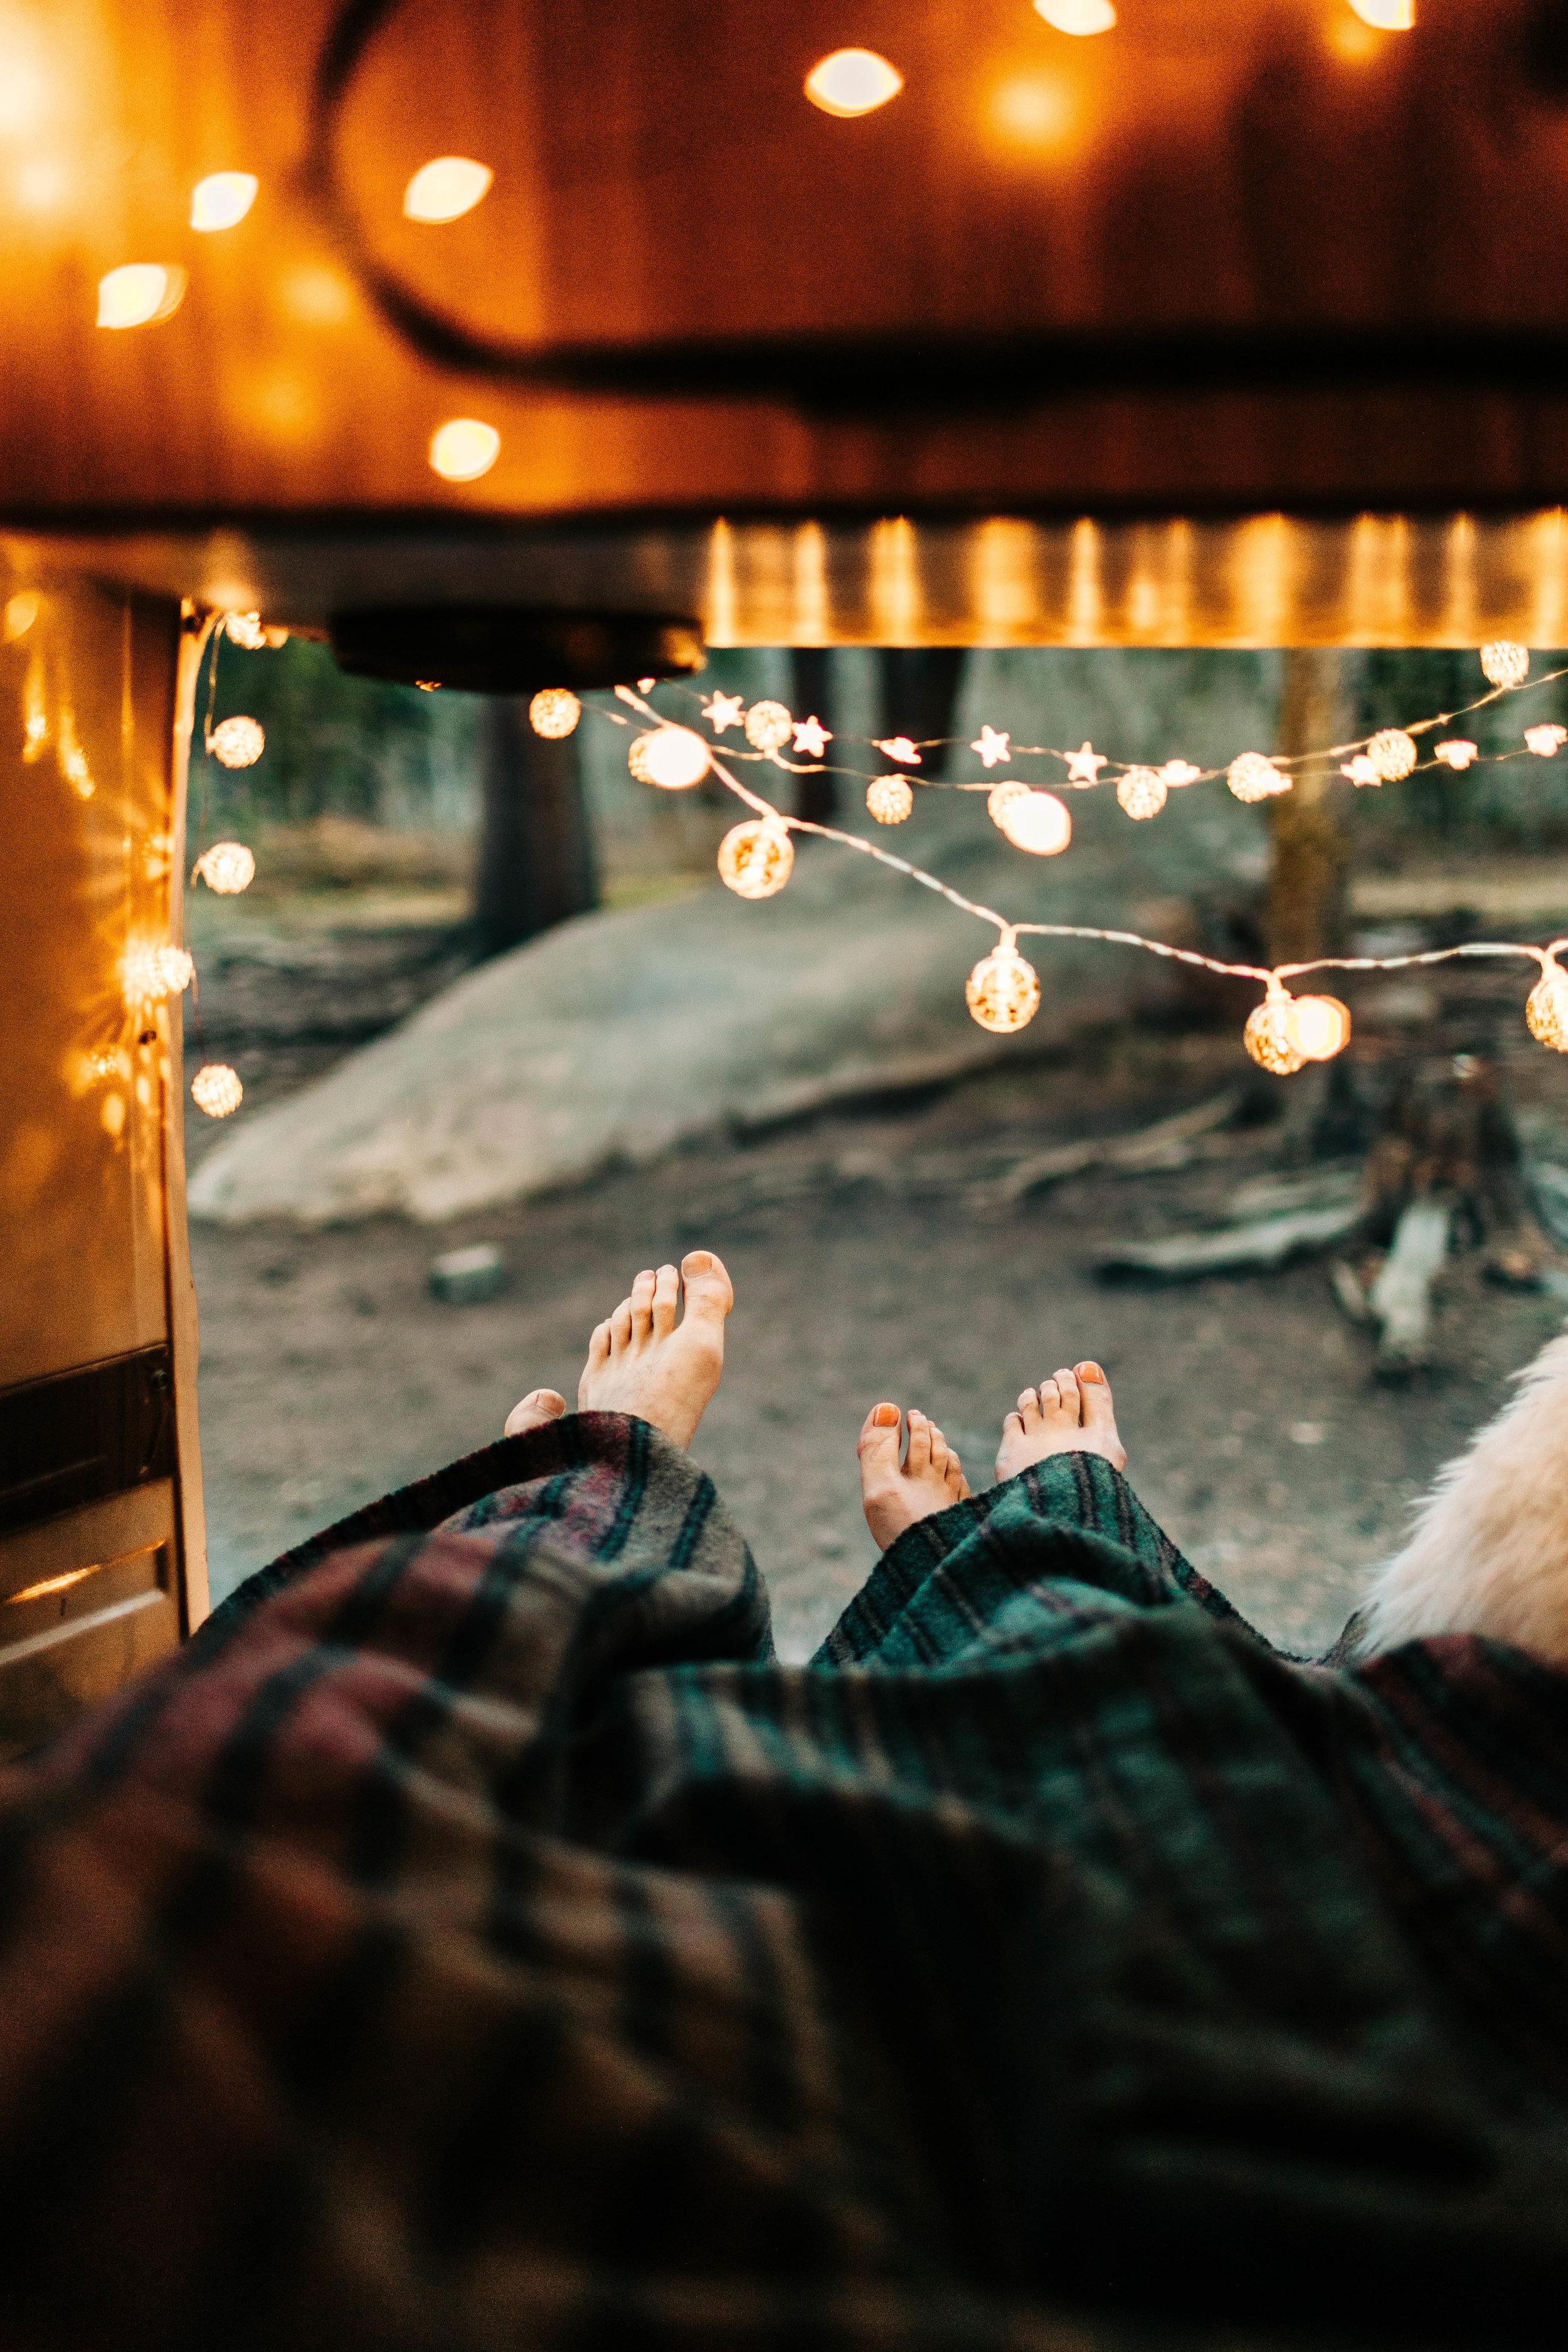 post elopement couples photos inside a vintage camper van | Rocky Mountain elopement photographers